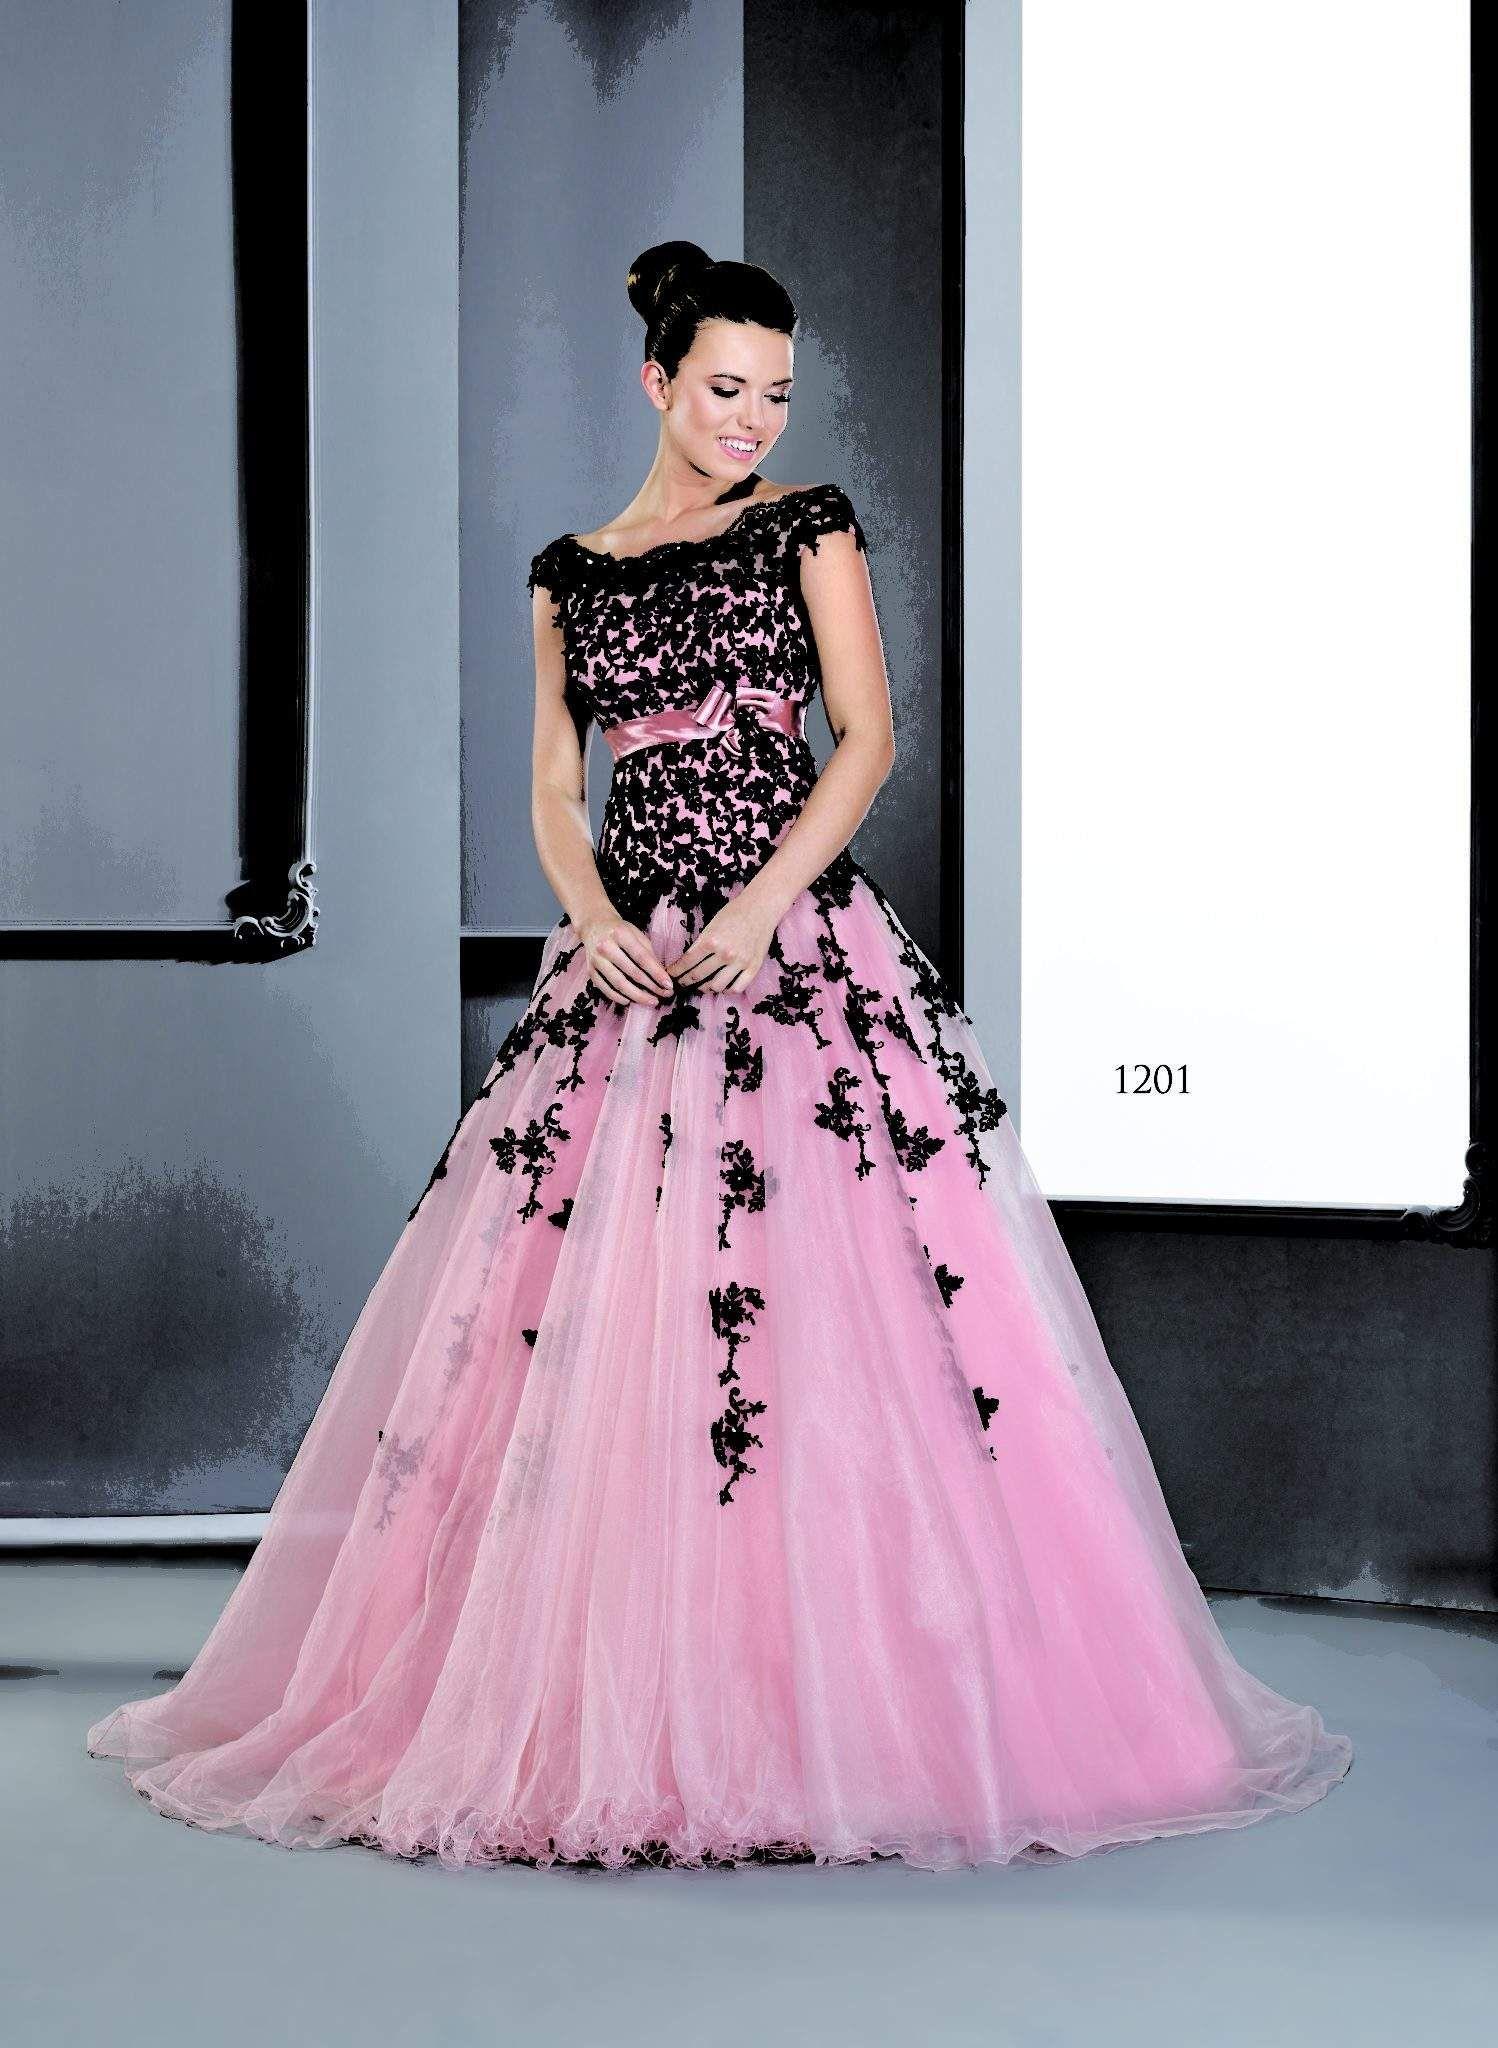 Pink Cap Sleeve Ball Gowns w/ Lace - Darius Cordell Fashion Ltd ...